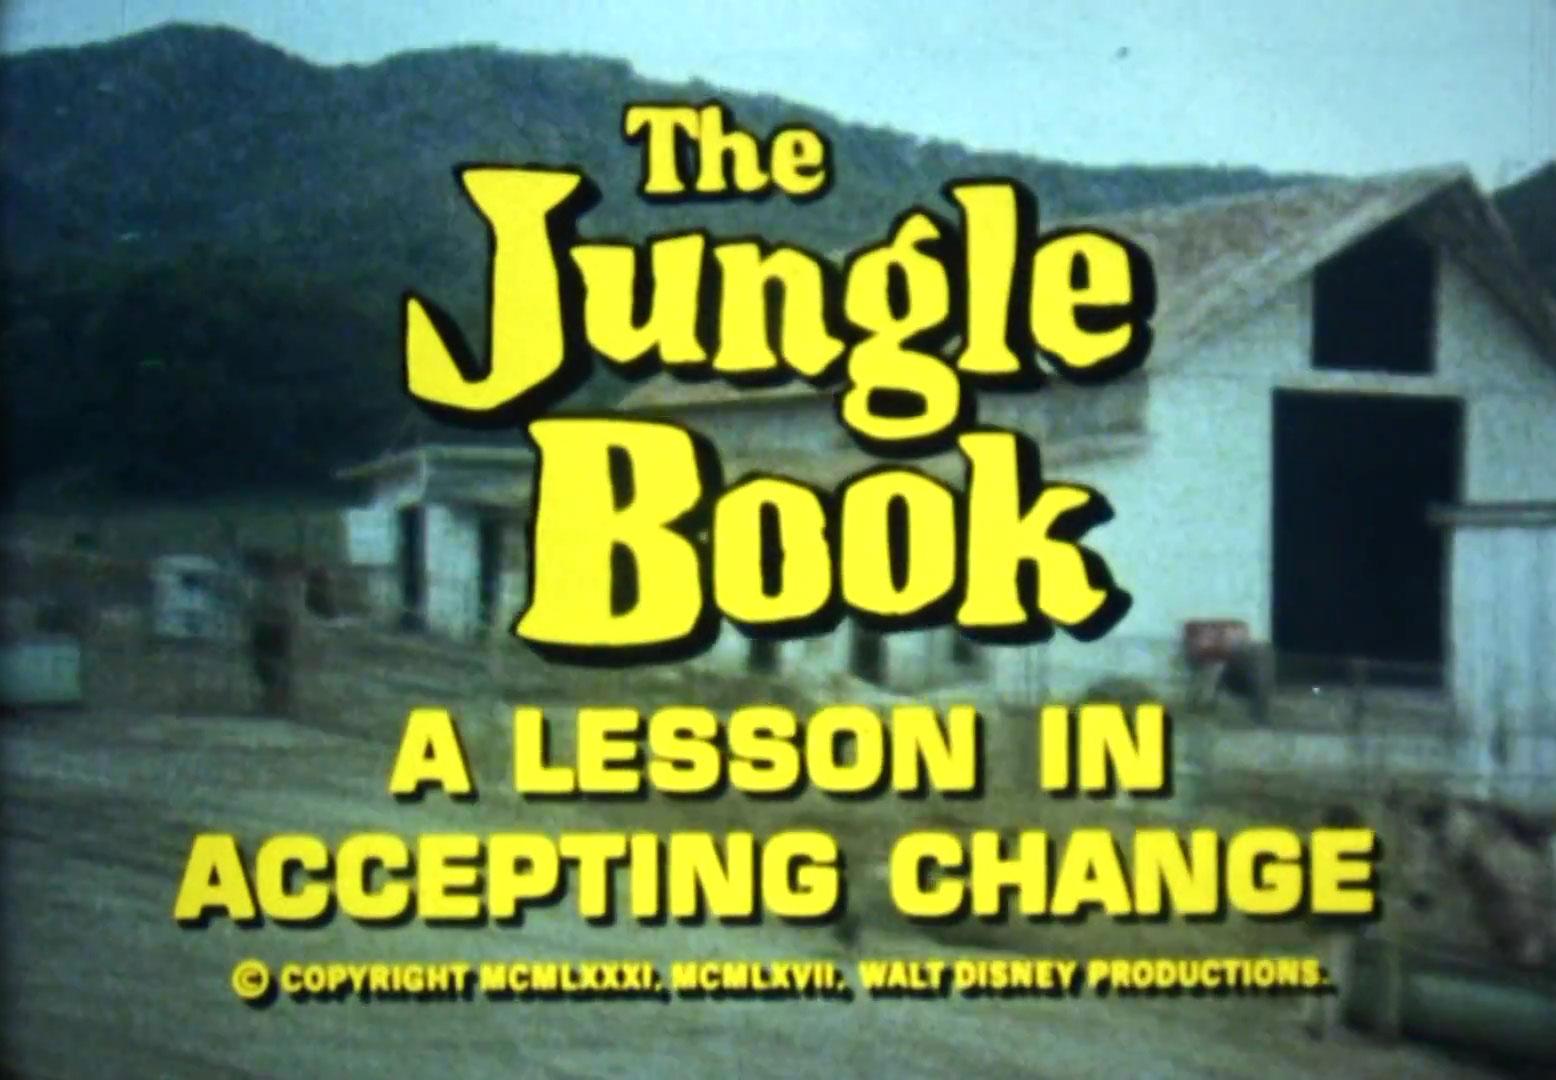 affiche poster jungle book lesson accepting change disney